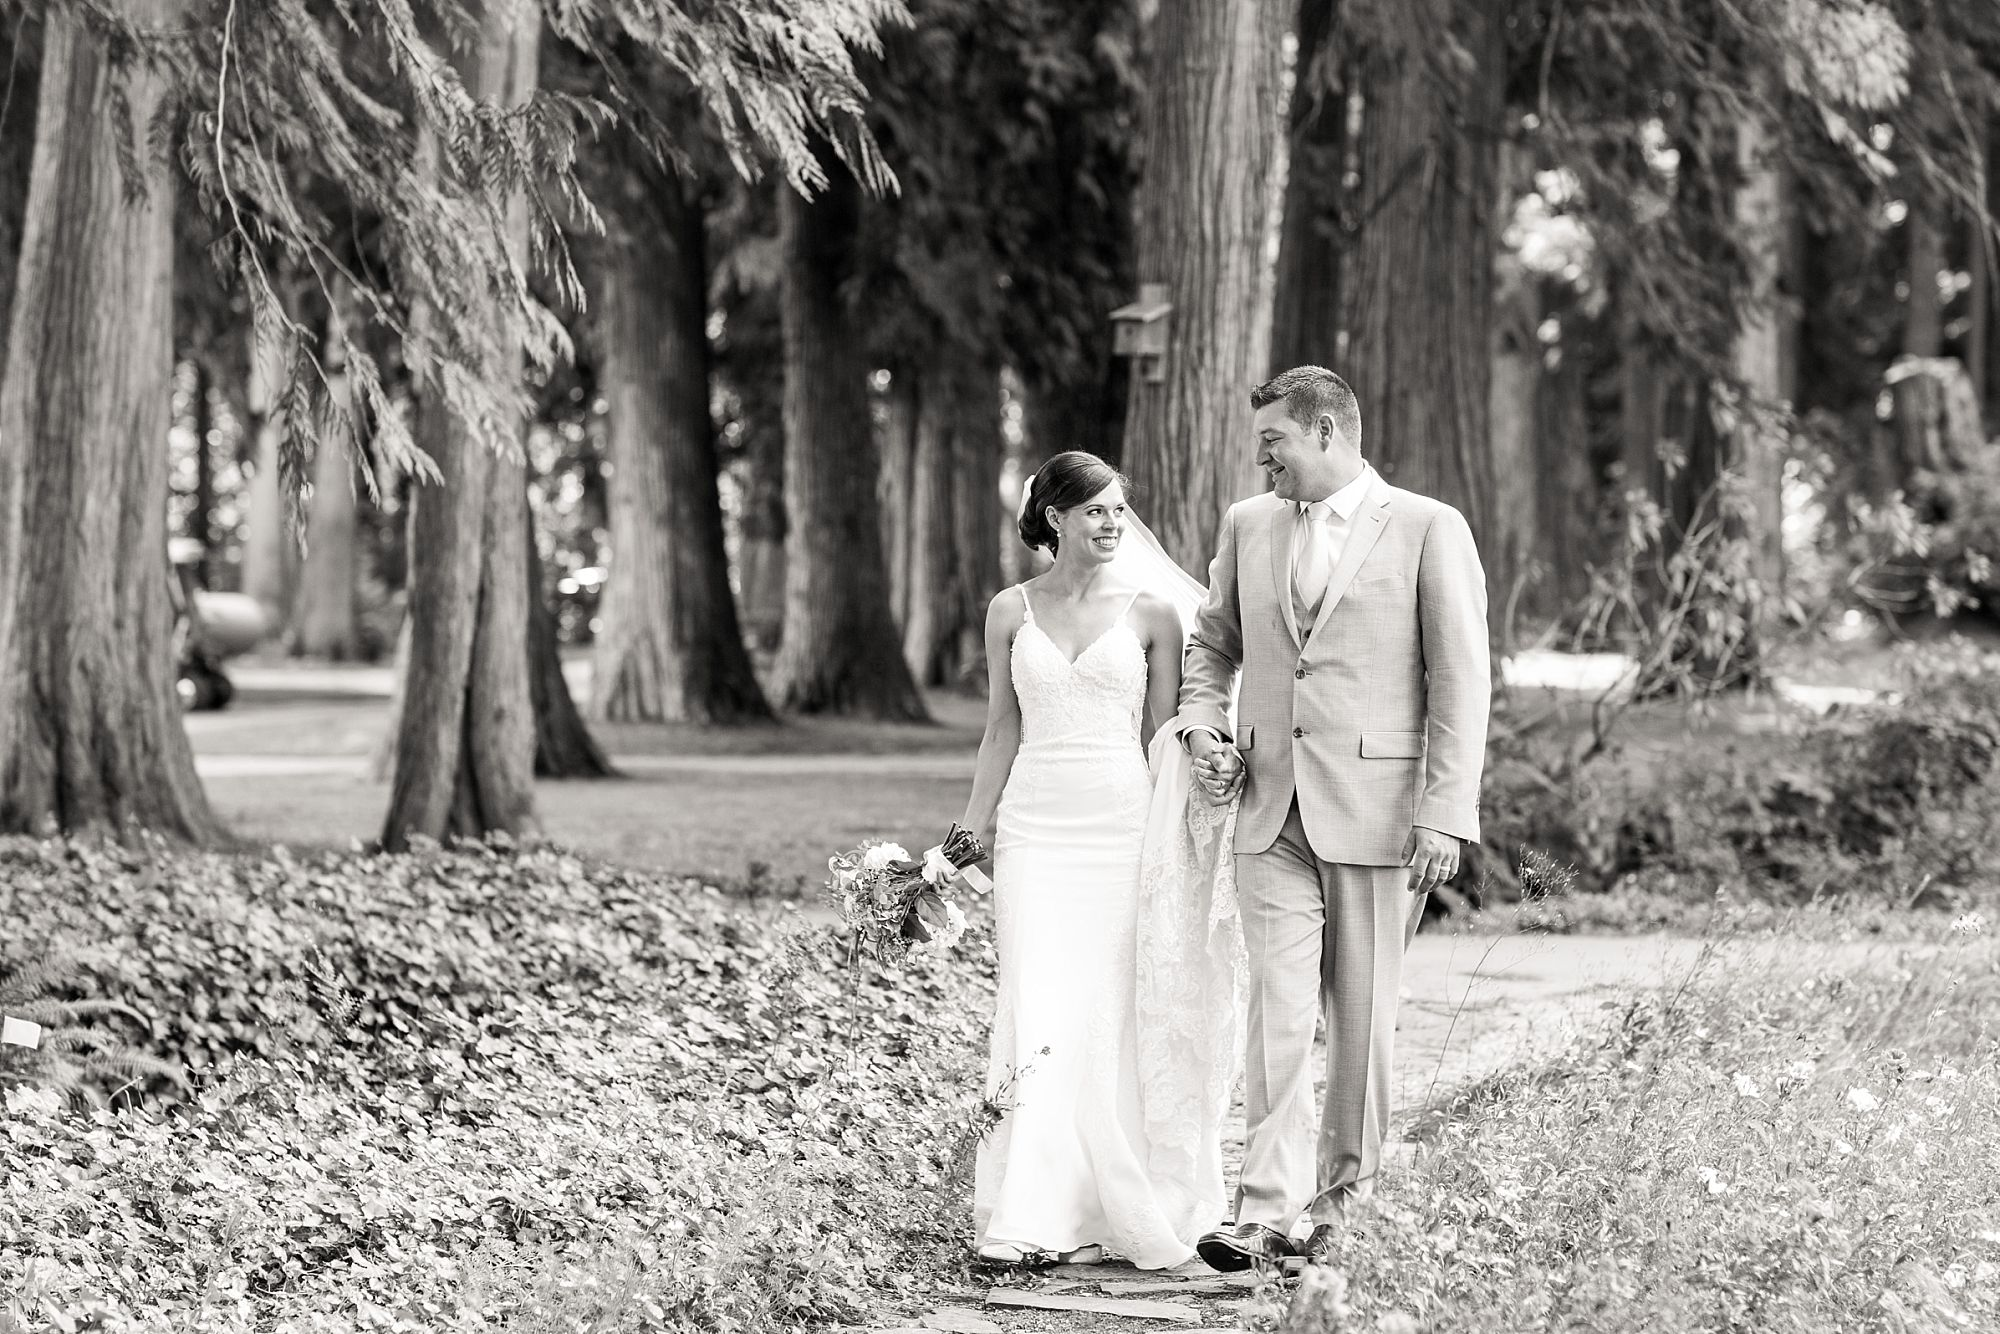 Vancouver Wedding Photography Hayley Rae Photography Associate_0009.jpg